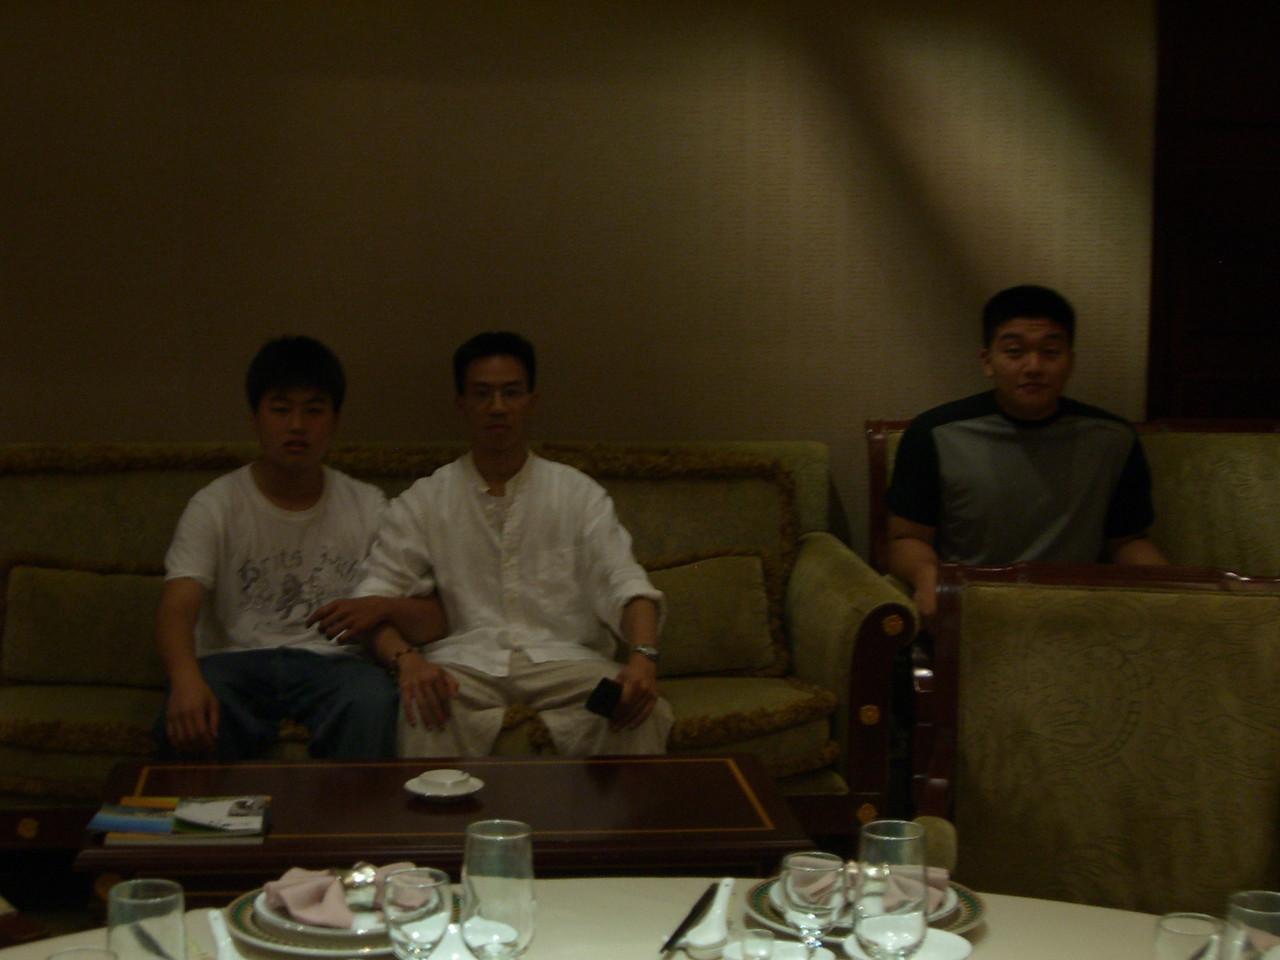 2006 07 14 Fri - Chinese couple & kid photo - Isaac Choi, Ben Yu, & Dan Tung